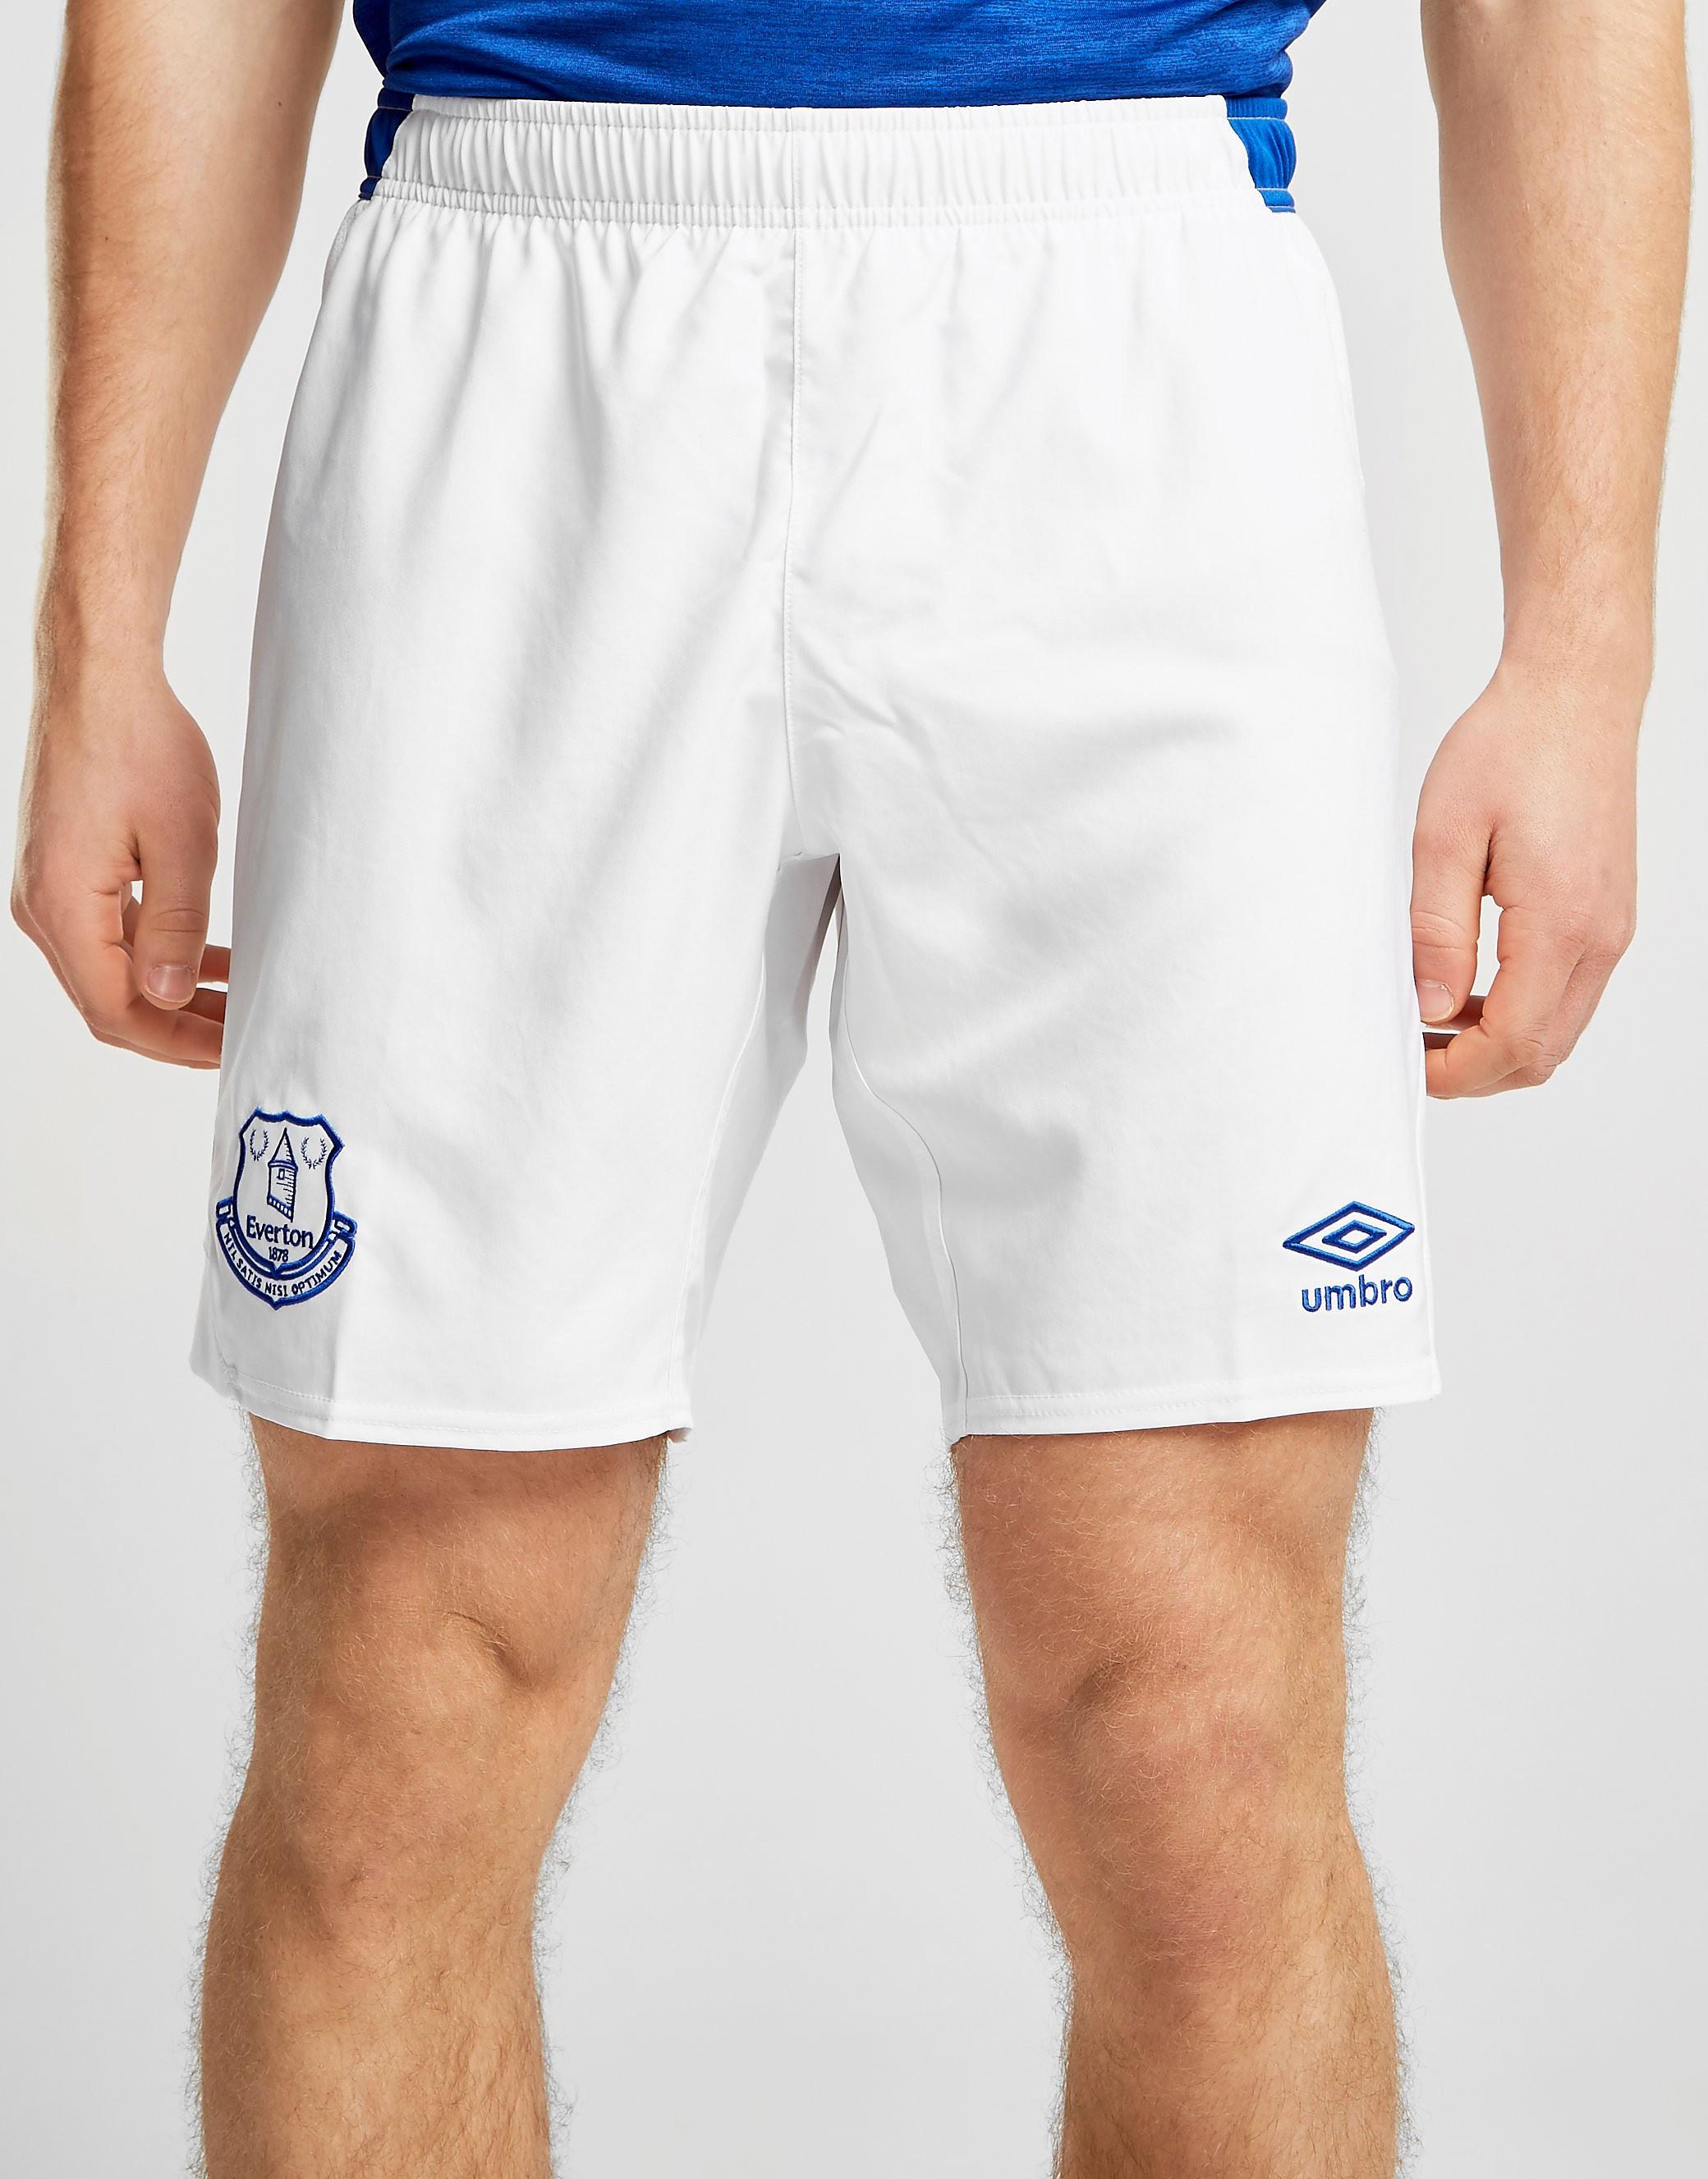 Umbro Short Domicile Everton FC 2018/19 Homme